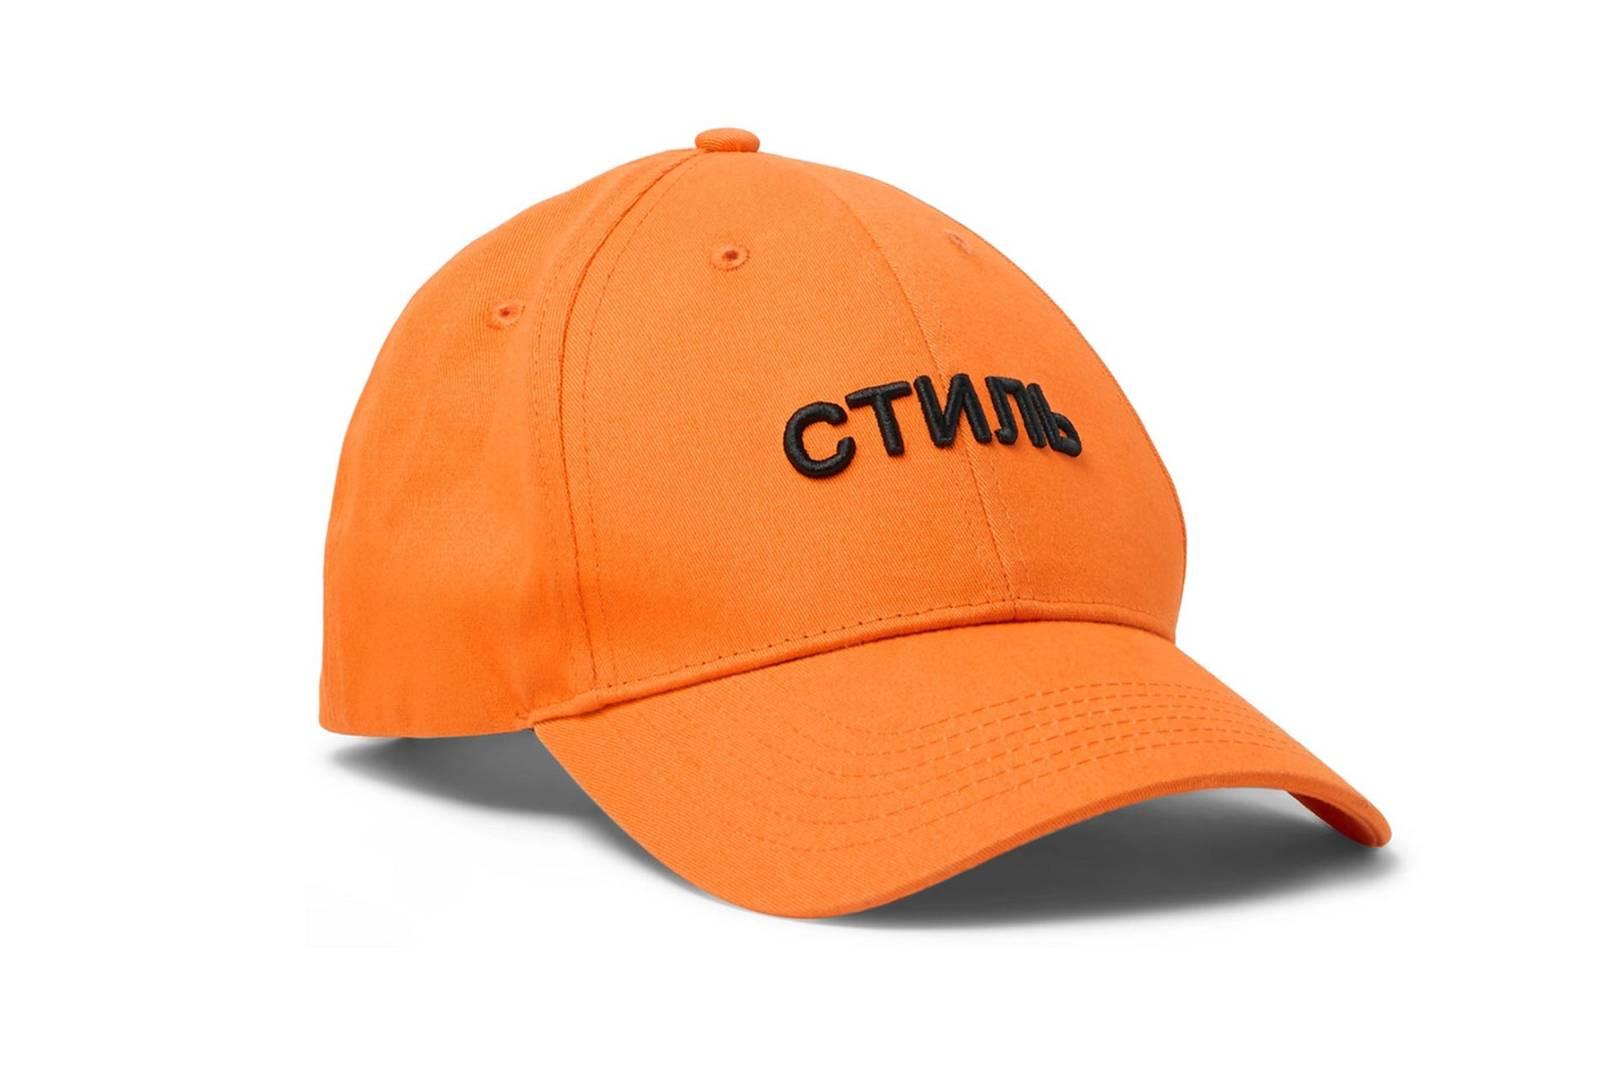 78ec3f04ce0 Best men s caps for the summer